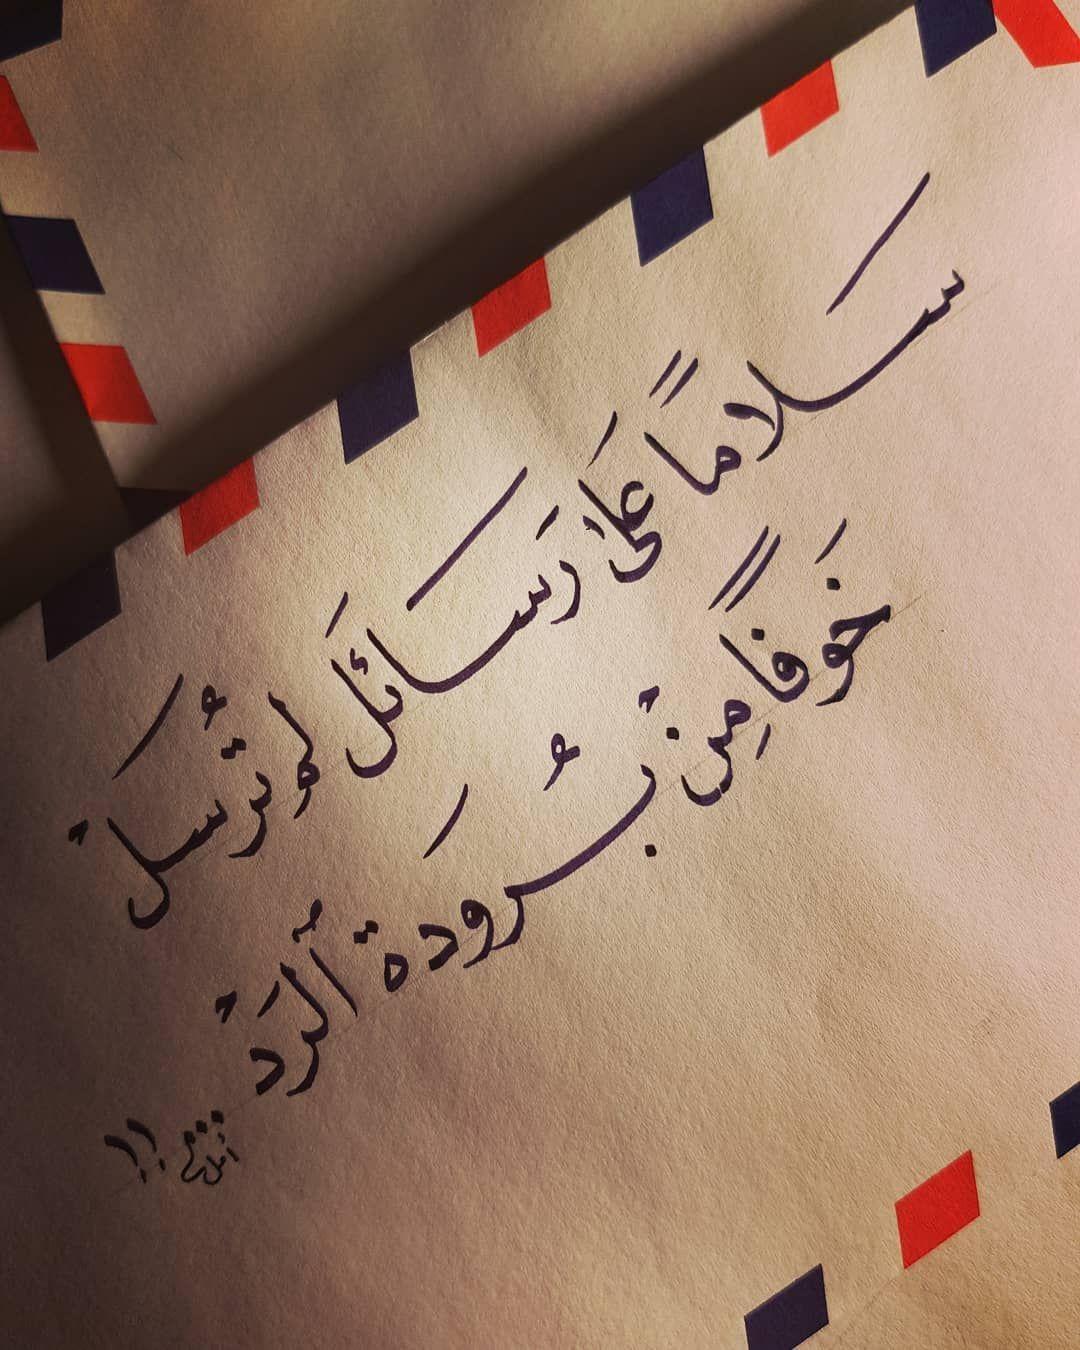 Pin By Ghada On خط Beautiful Arabic Words Arabic Calligraphy Arabic Words